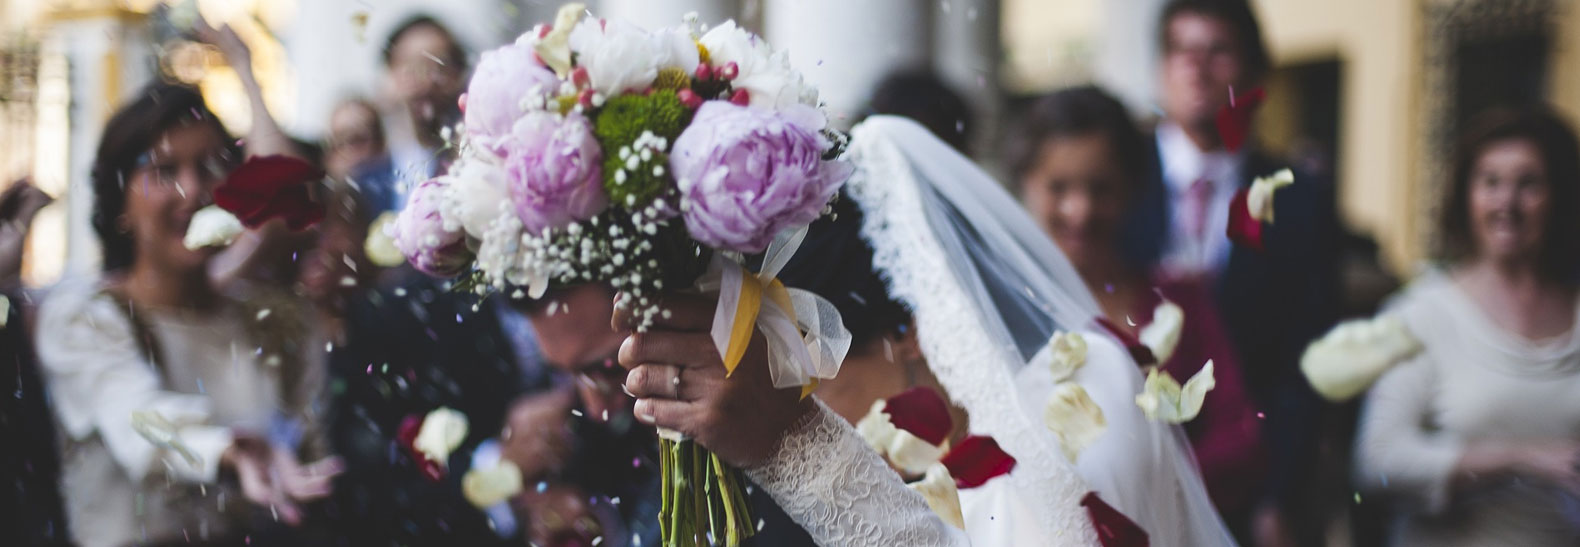 matrimonio toscana per stranieri